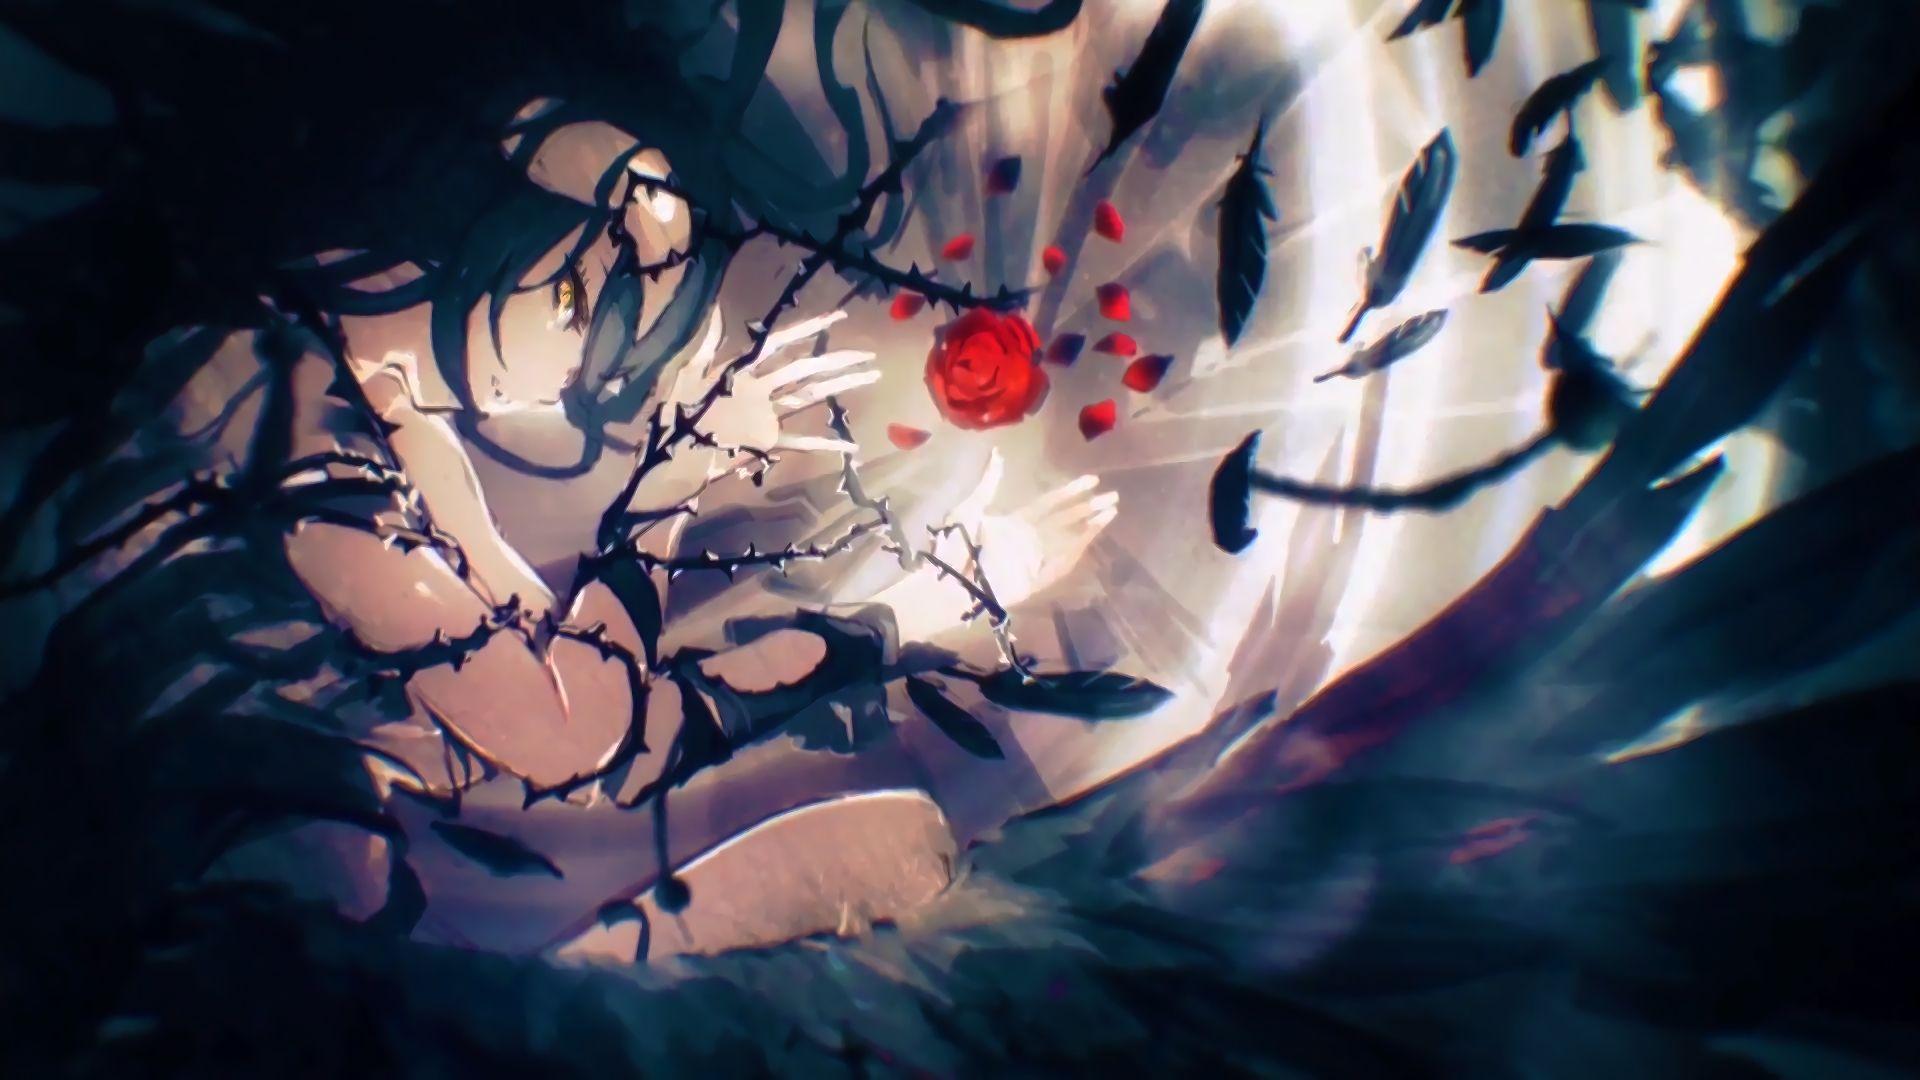 Albedo Overlord Anime 1920x1080 Wallpaper Albedo Anime Anime Wallpaper 1920x1080